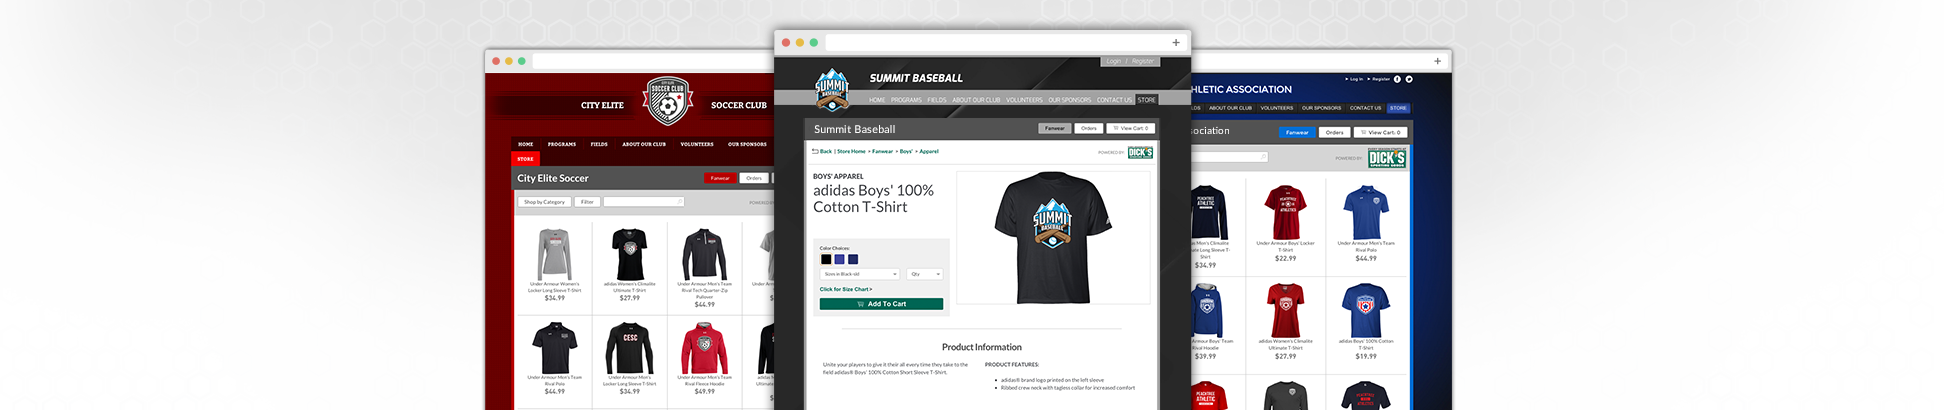 team sports fanwear